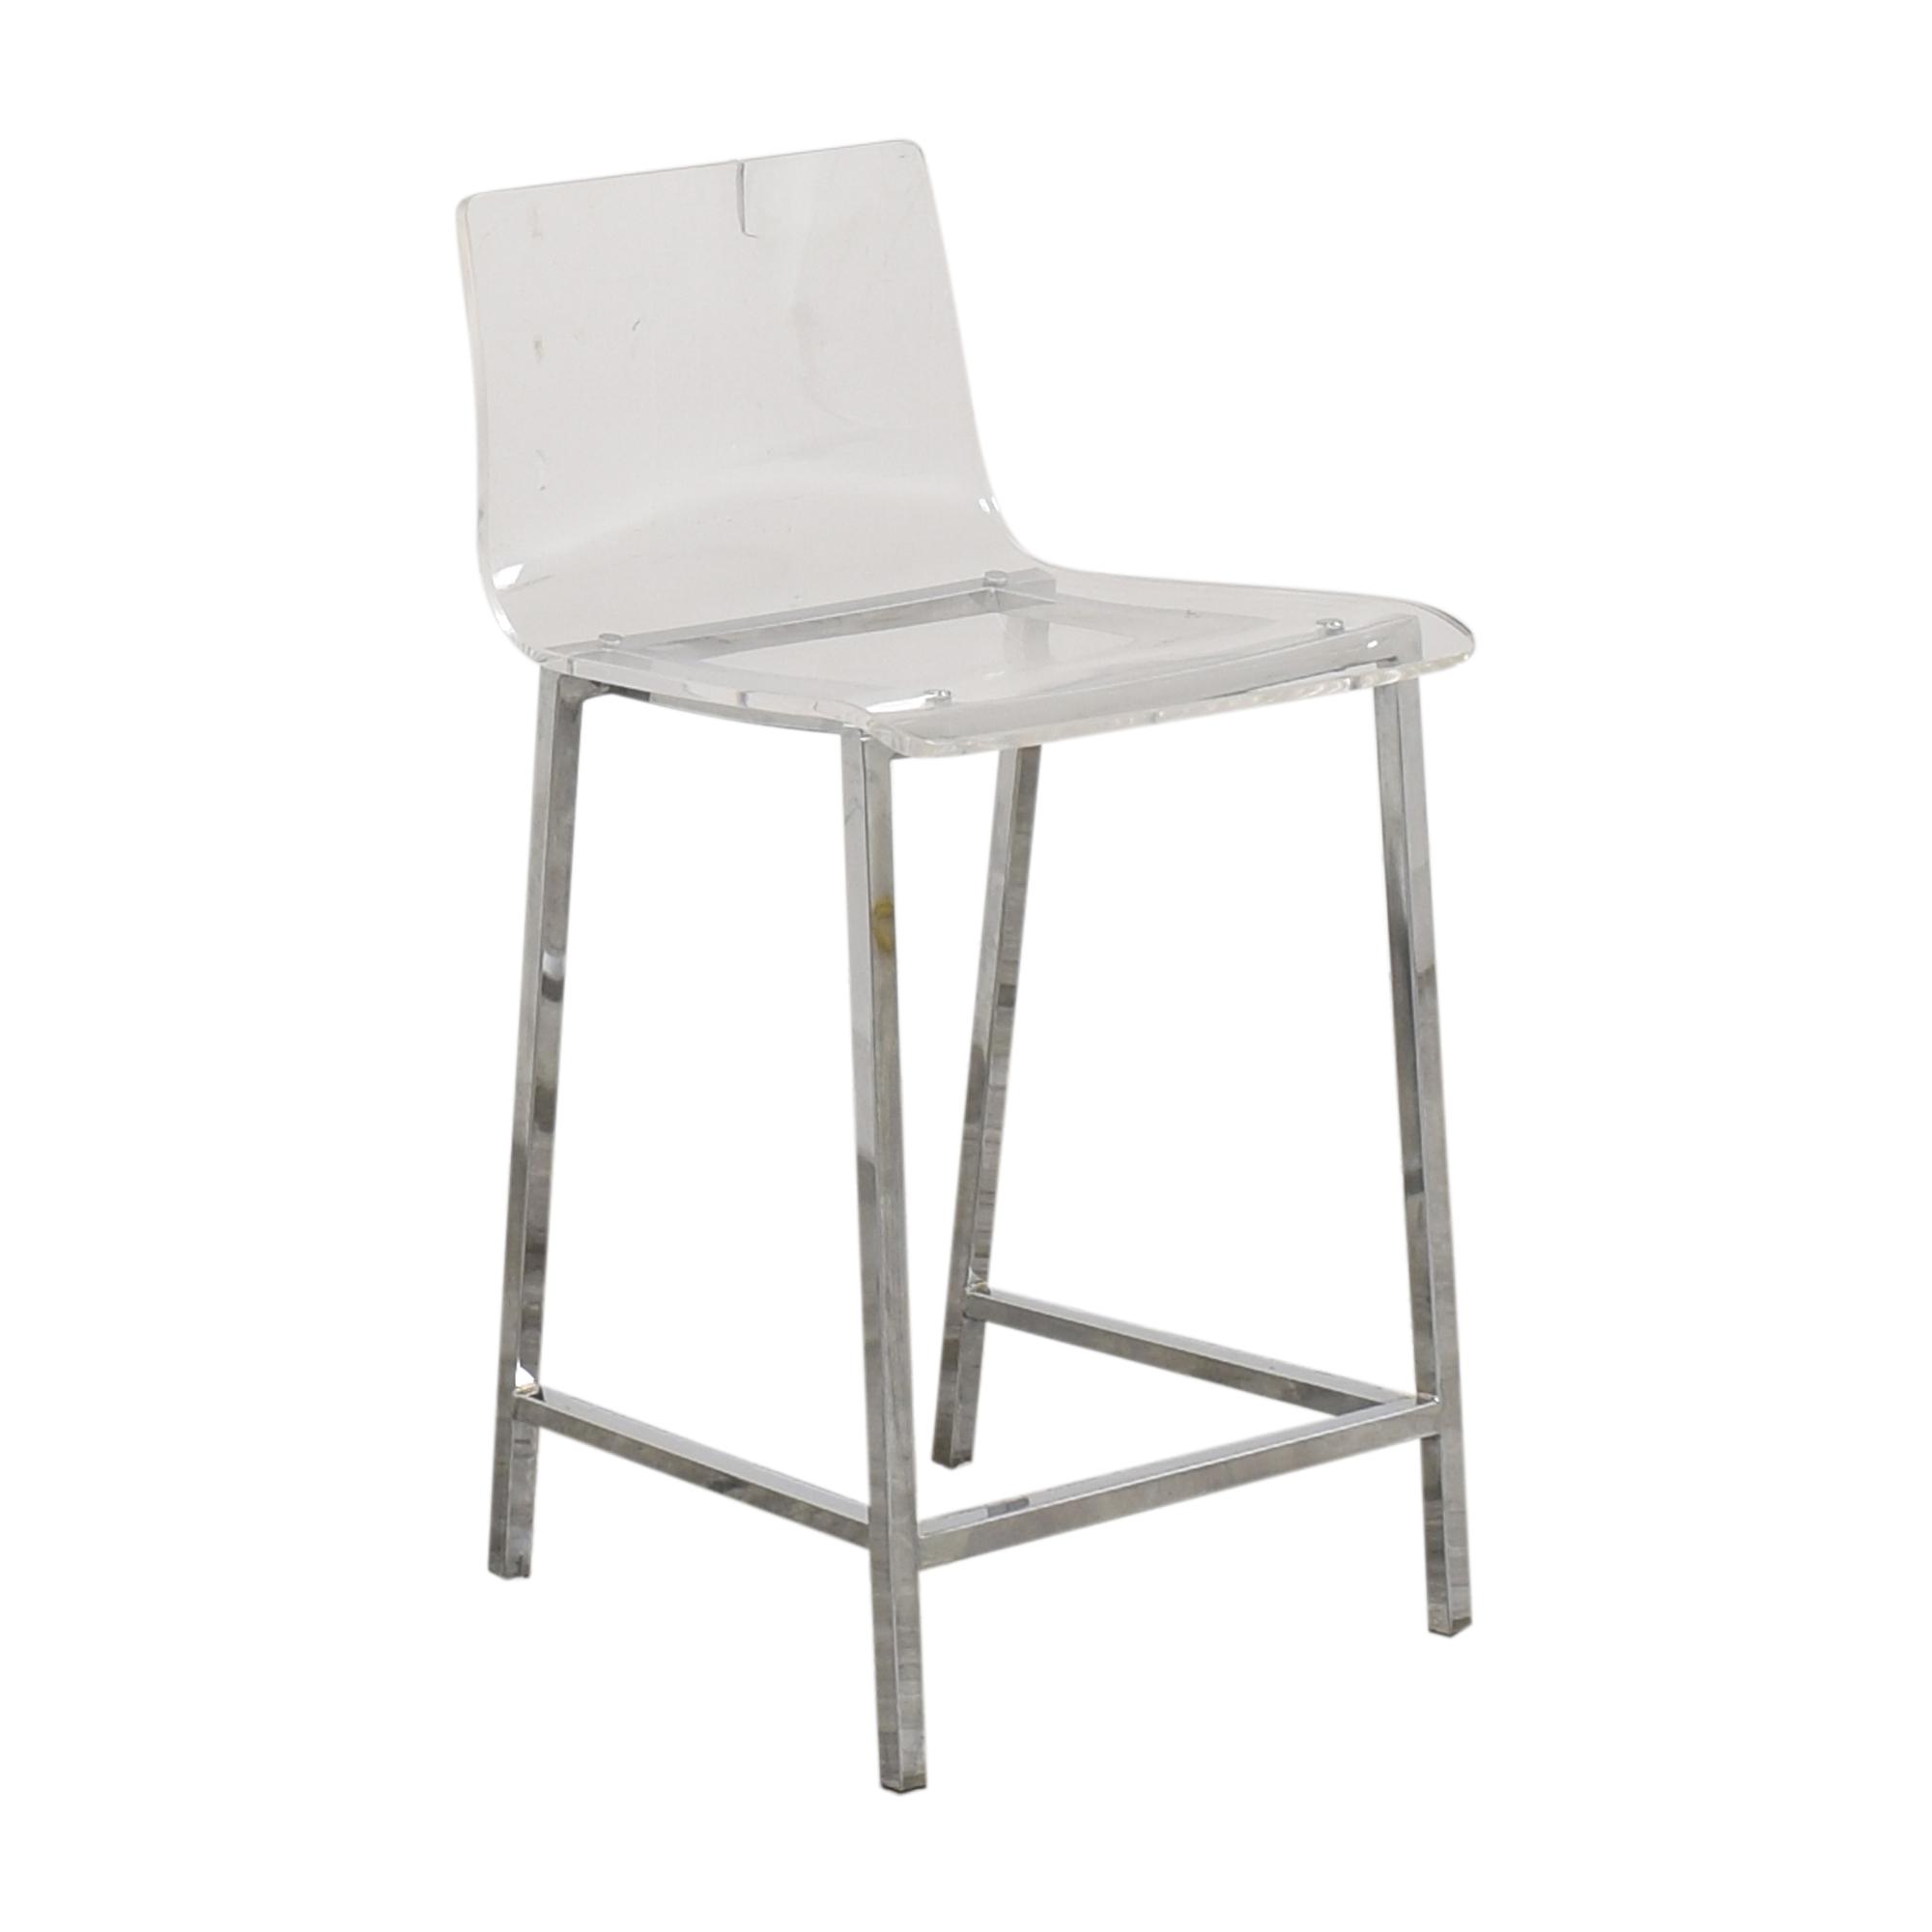 CB2 CB2 Chiaro Clear Counter Stool Chairs